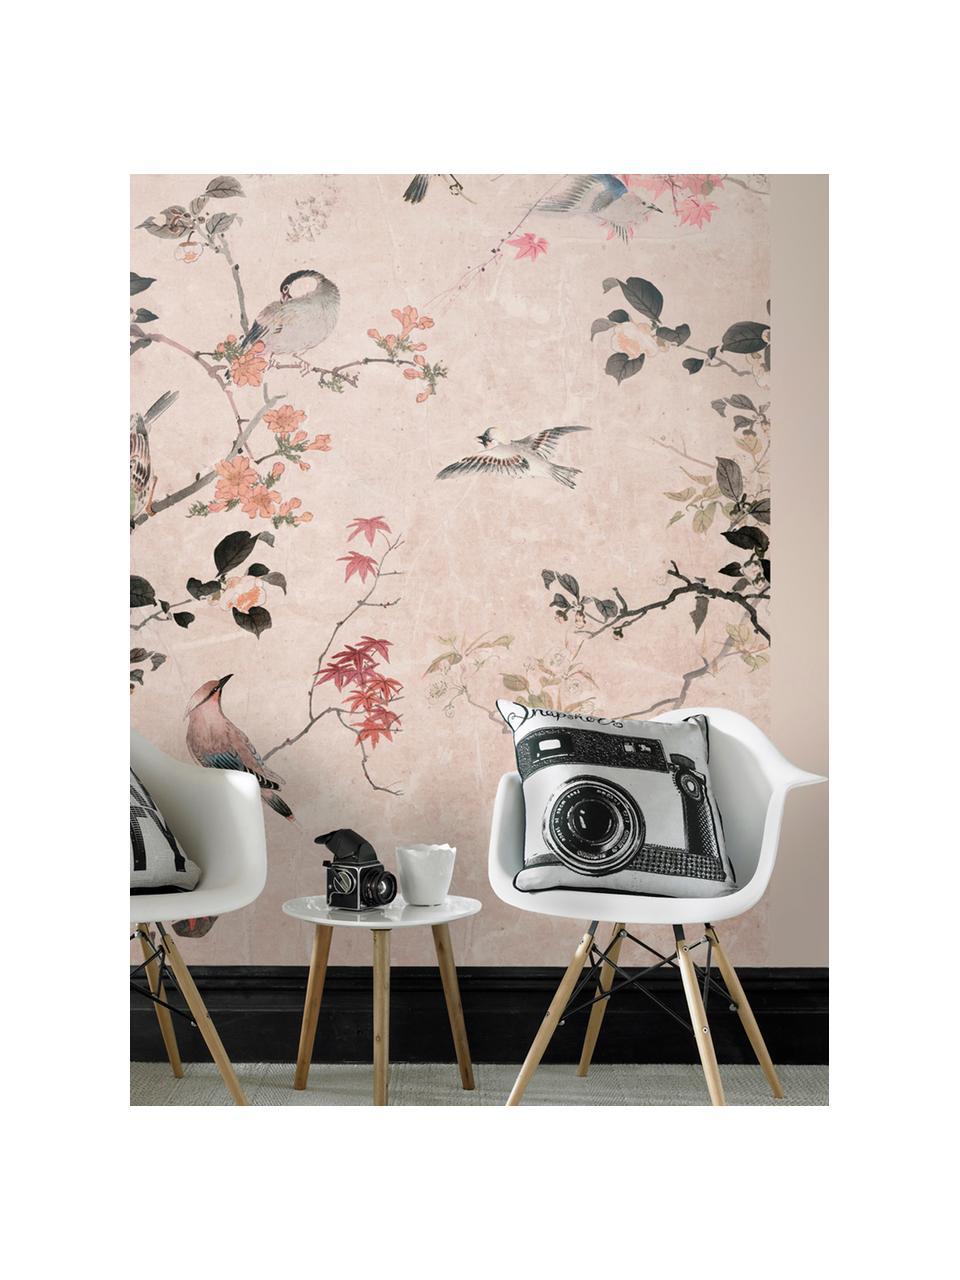 Adesivo murale Japanese Garden, Tessuto non tessuto, Rosa, multicolore, Larg. 200 x Alt. 280 cm